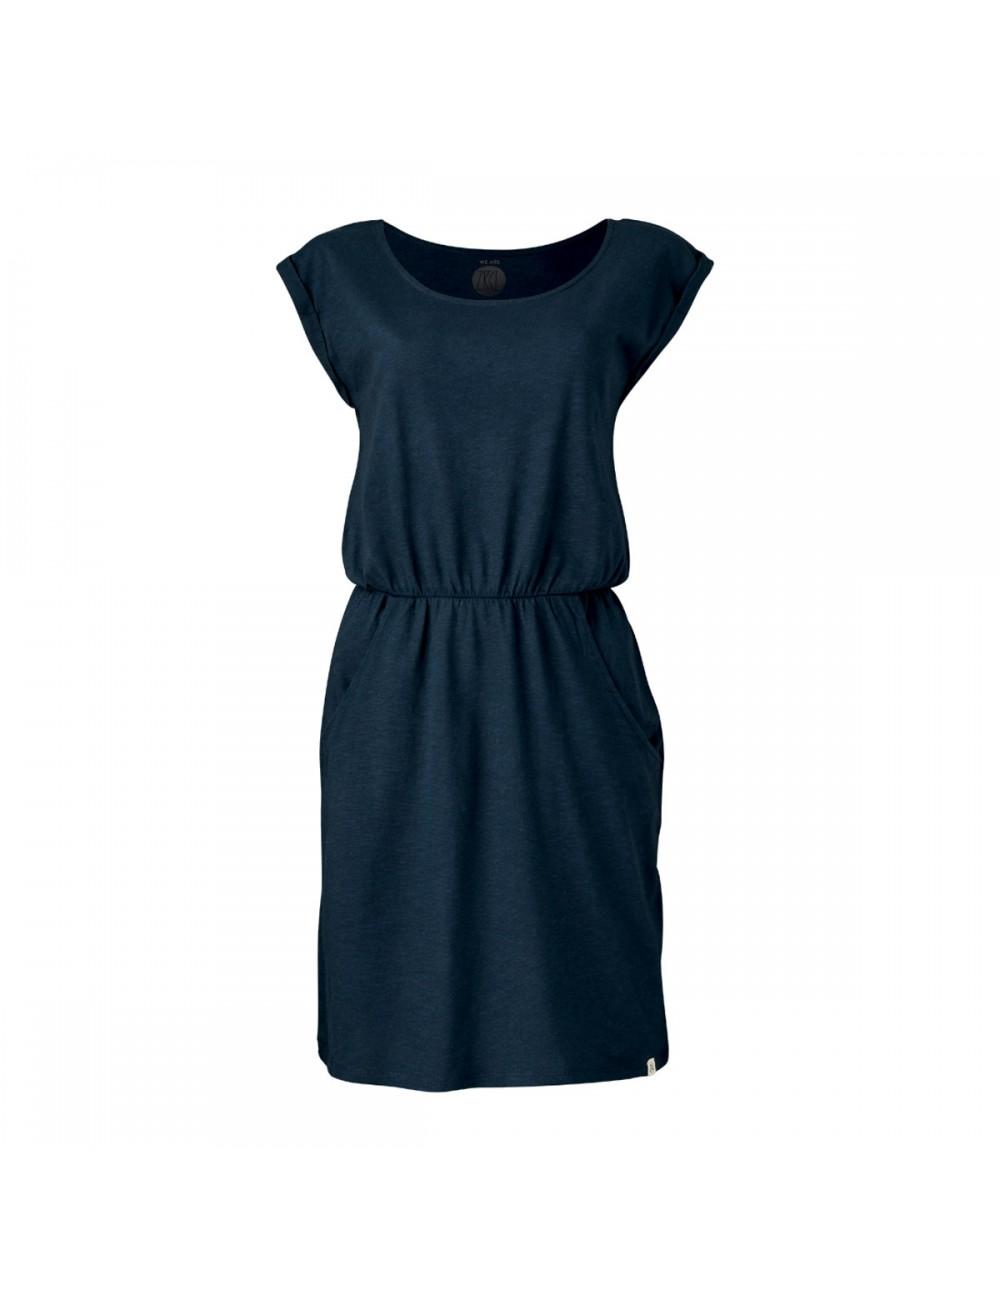 ZRCL Basic Dress - Blue Slub_11981